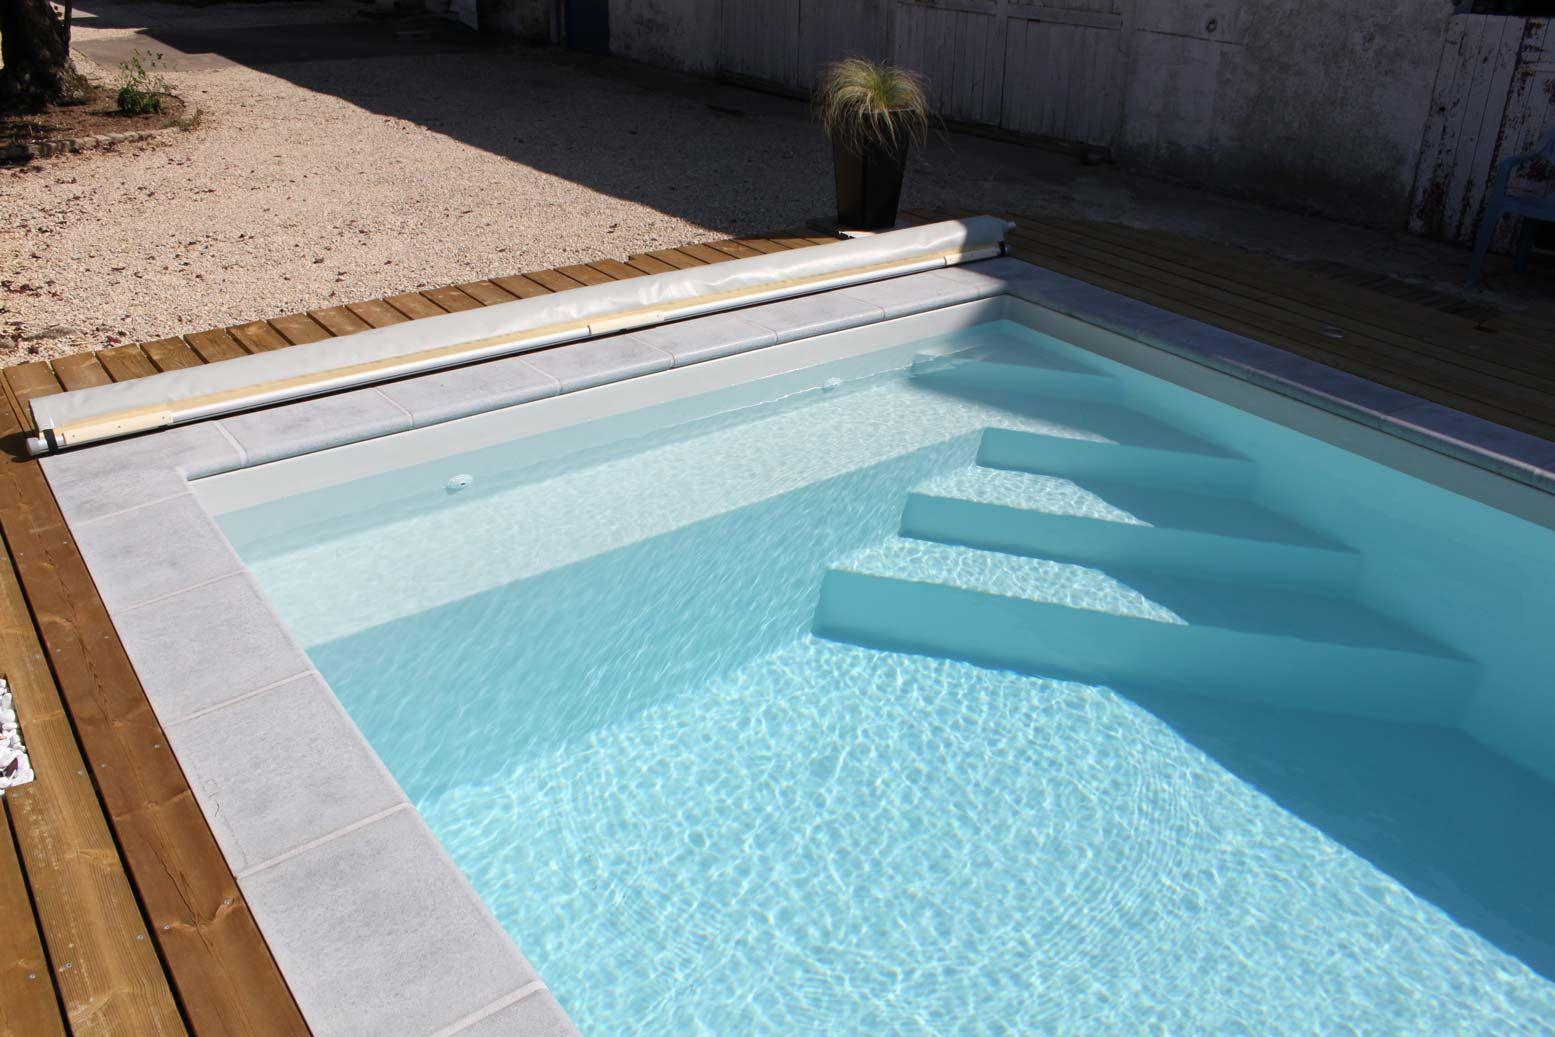 escalier banquette piscine recherche google piscine escalier piscine piscine et piscine 6x3. Black Bedroom Furniture Sets. Home Design Ideas